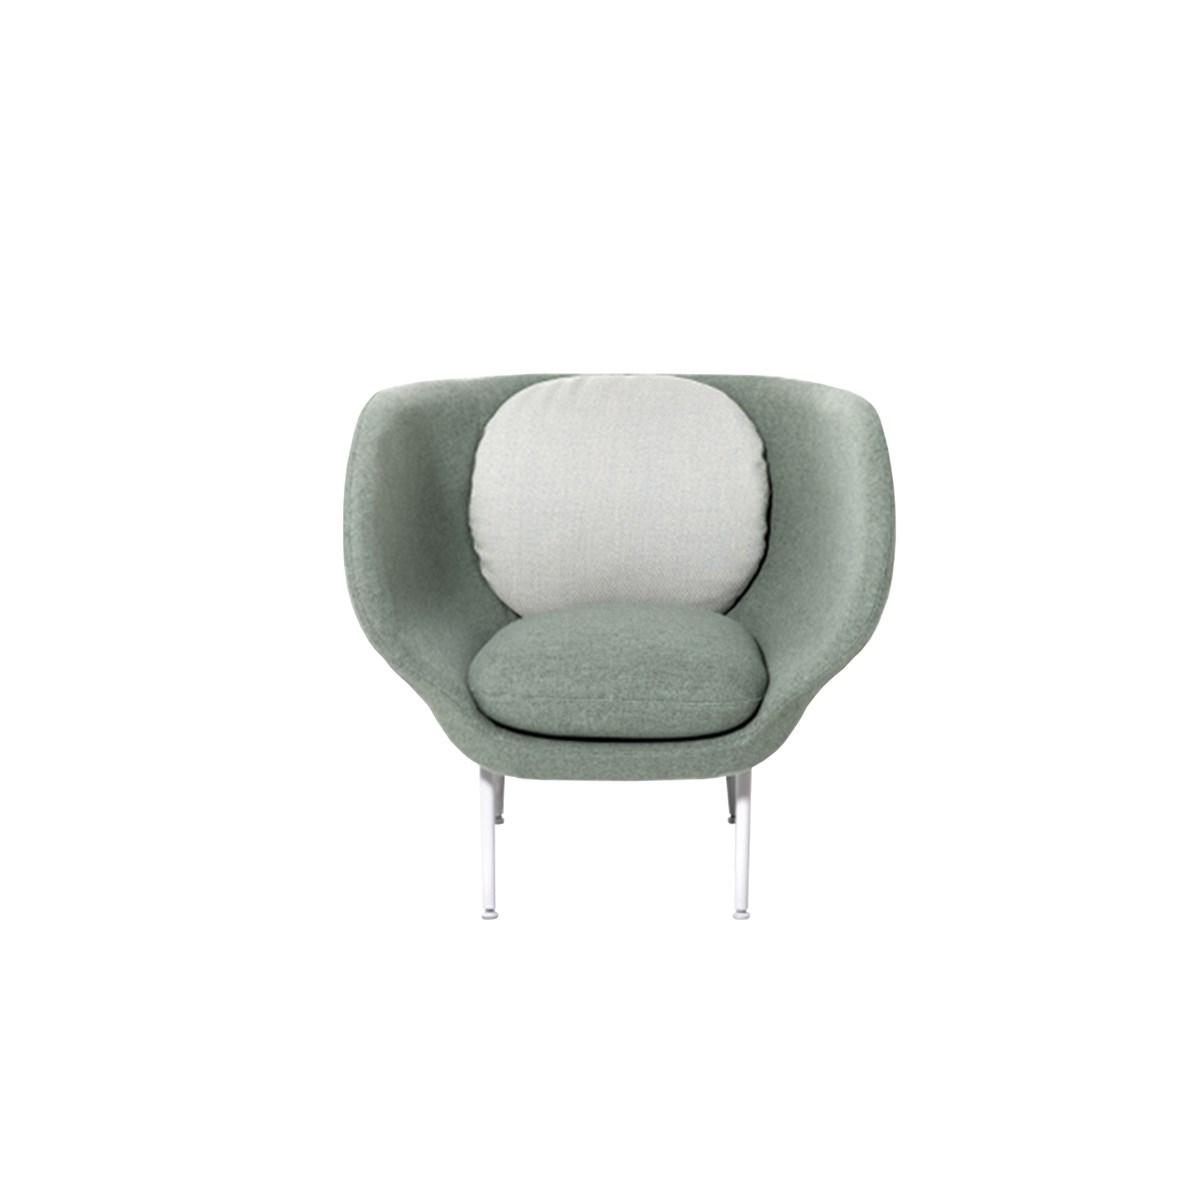 Moroso-Nipa-Doshi-Jonathan-Levien-Armada-Armchair-Matisse-3